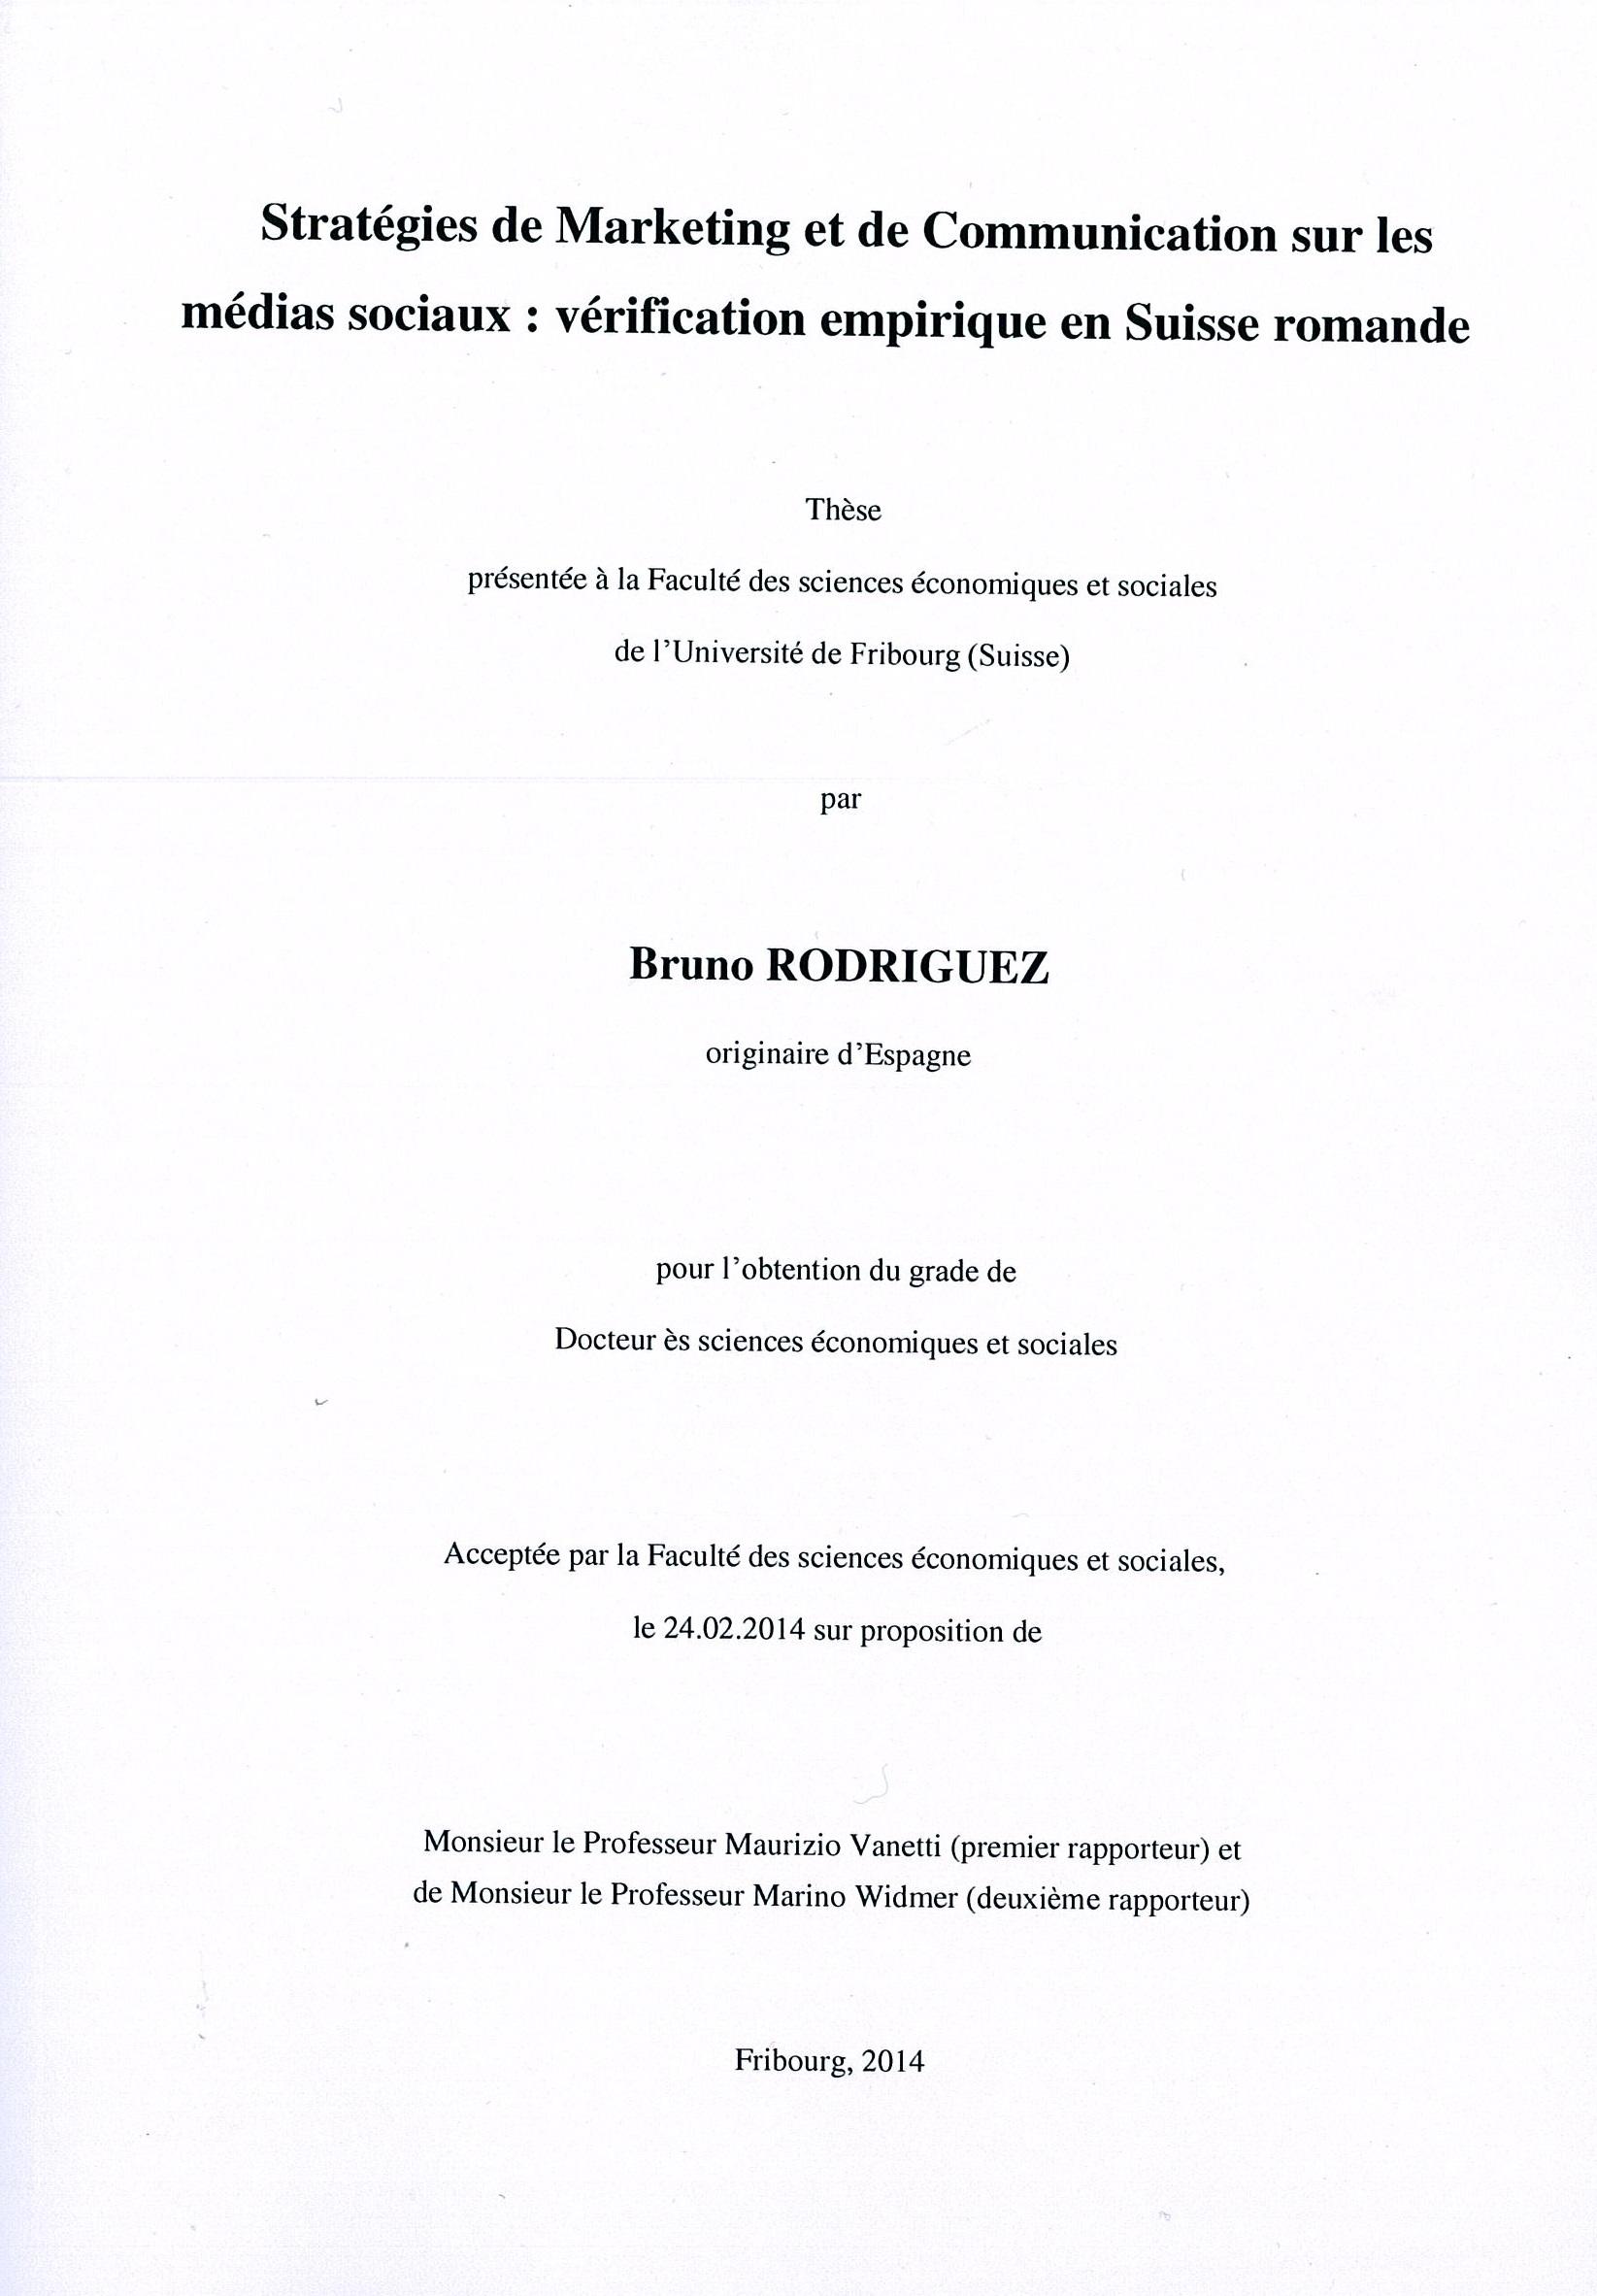 tort law essay format